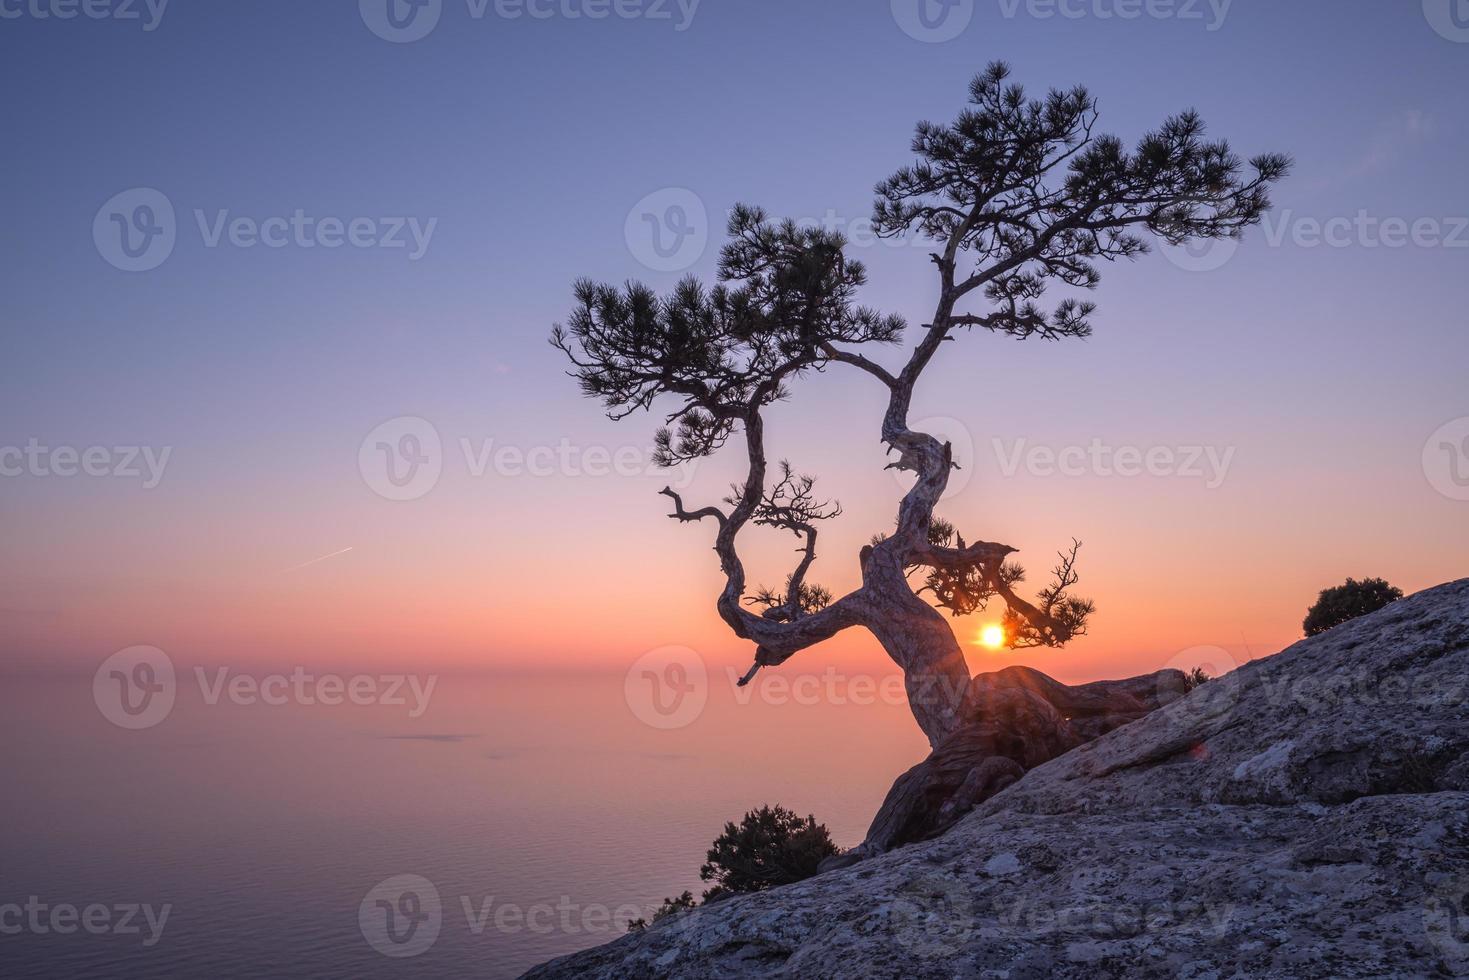 albero foto